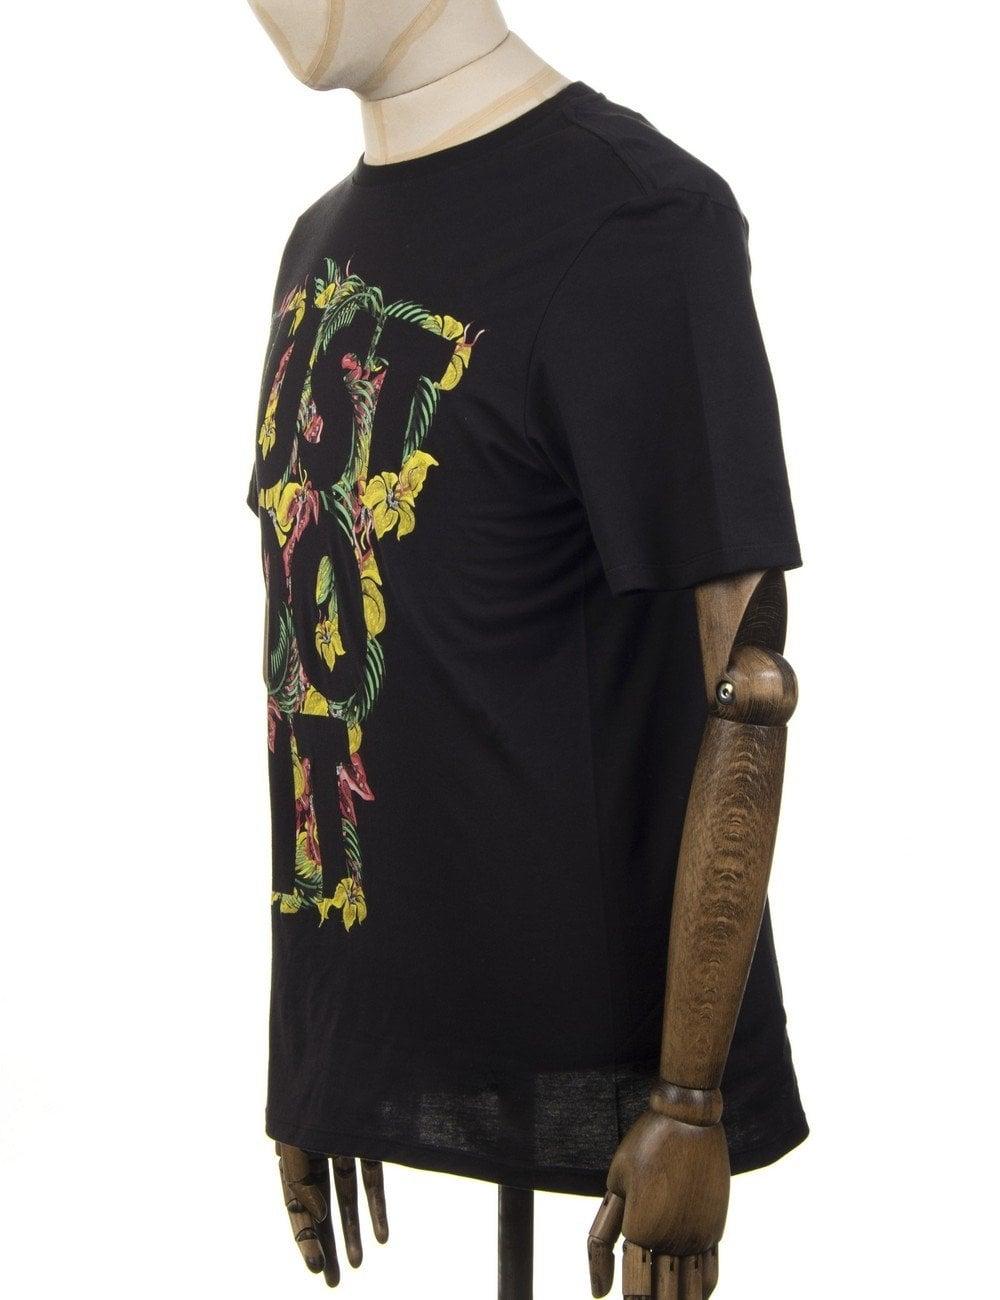 82840d49 Nike Floral JDI T-shirt - Black - Clothing from Fat Buddha Store UK